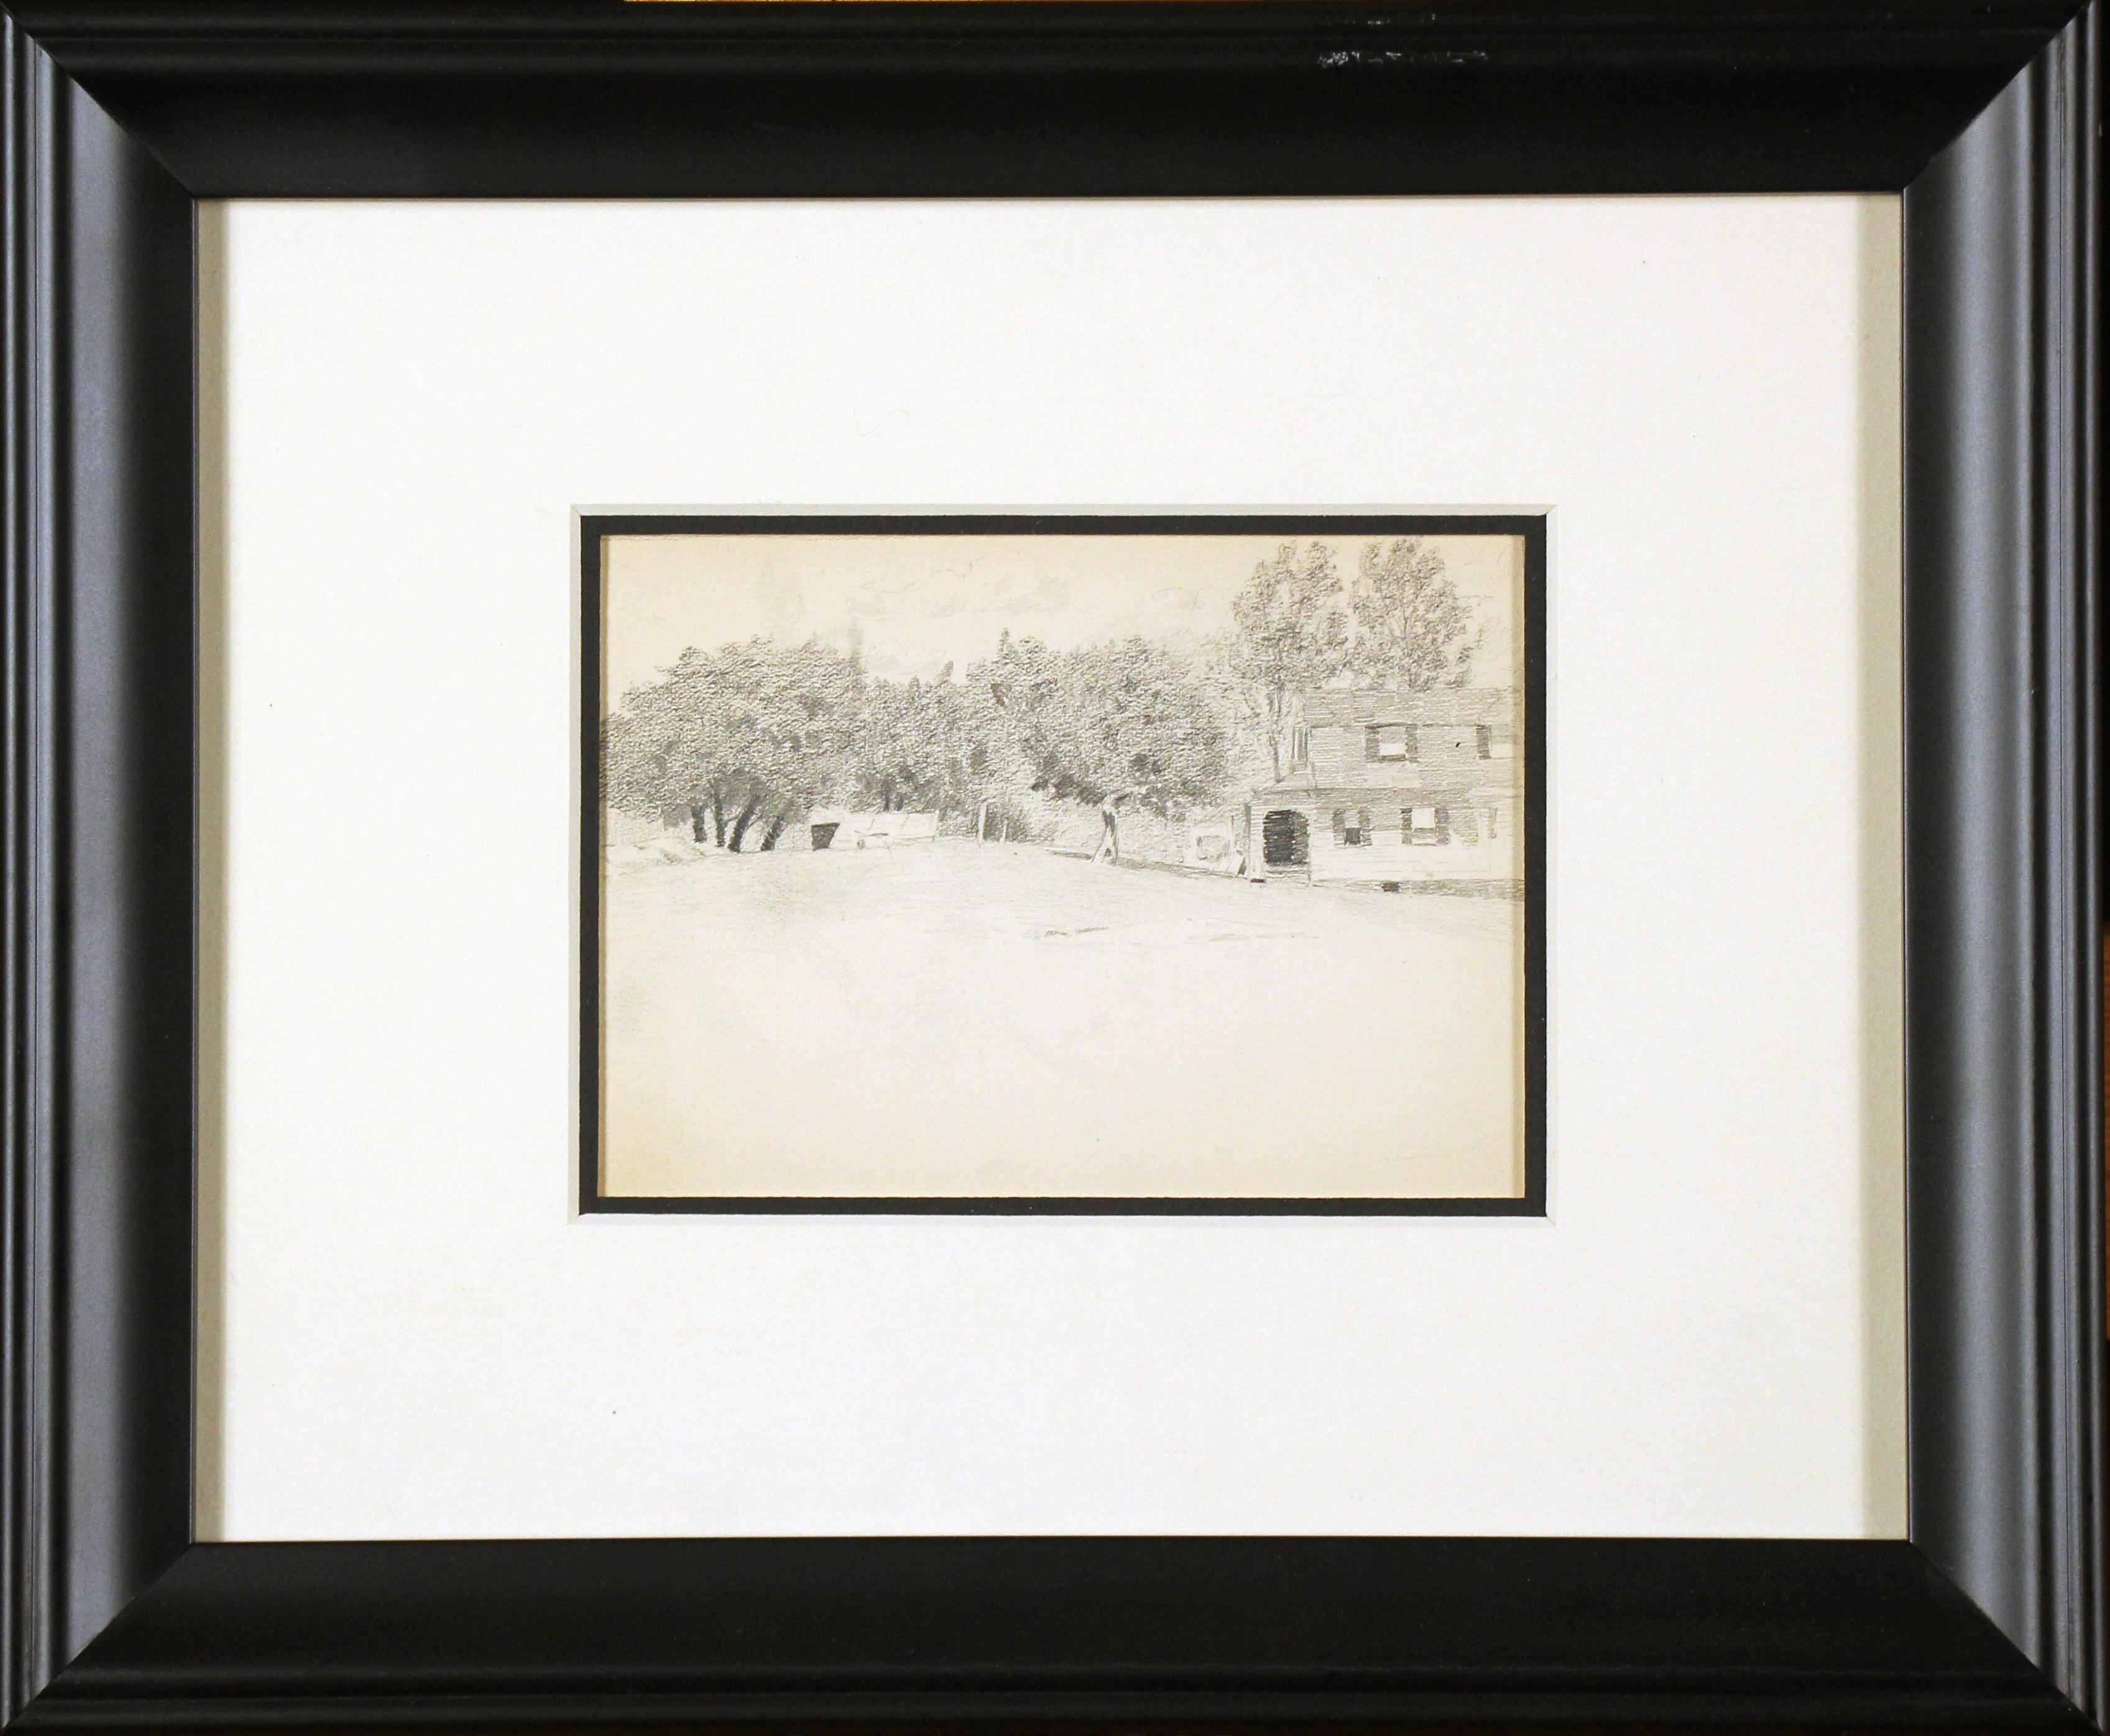 Bucks County Farmhouse, American Impressionist, Pencil Drawing on Paper, 1899